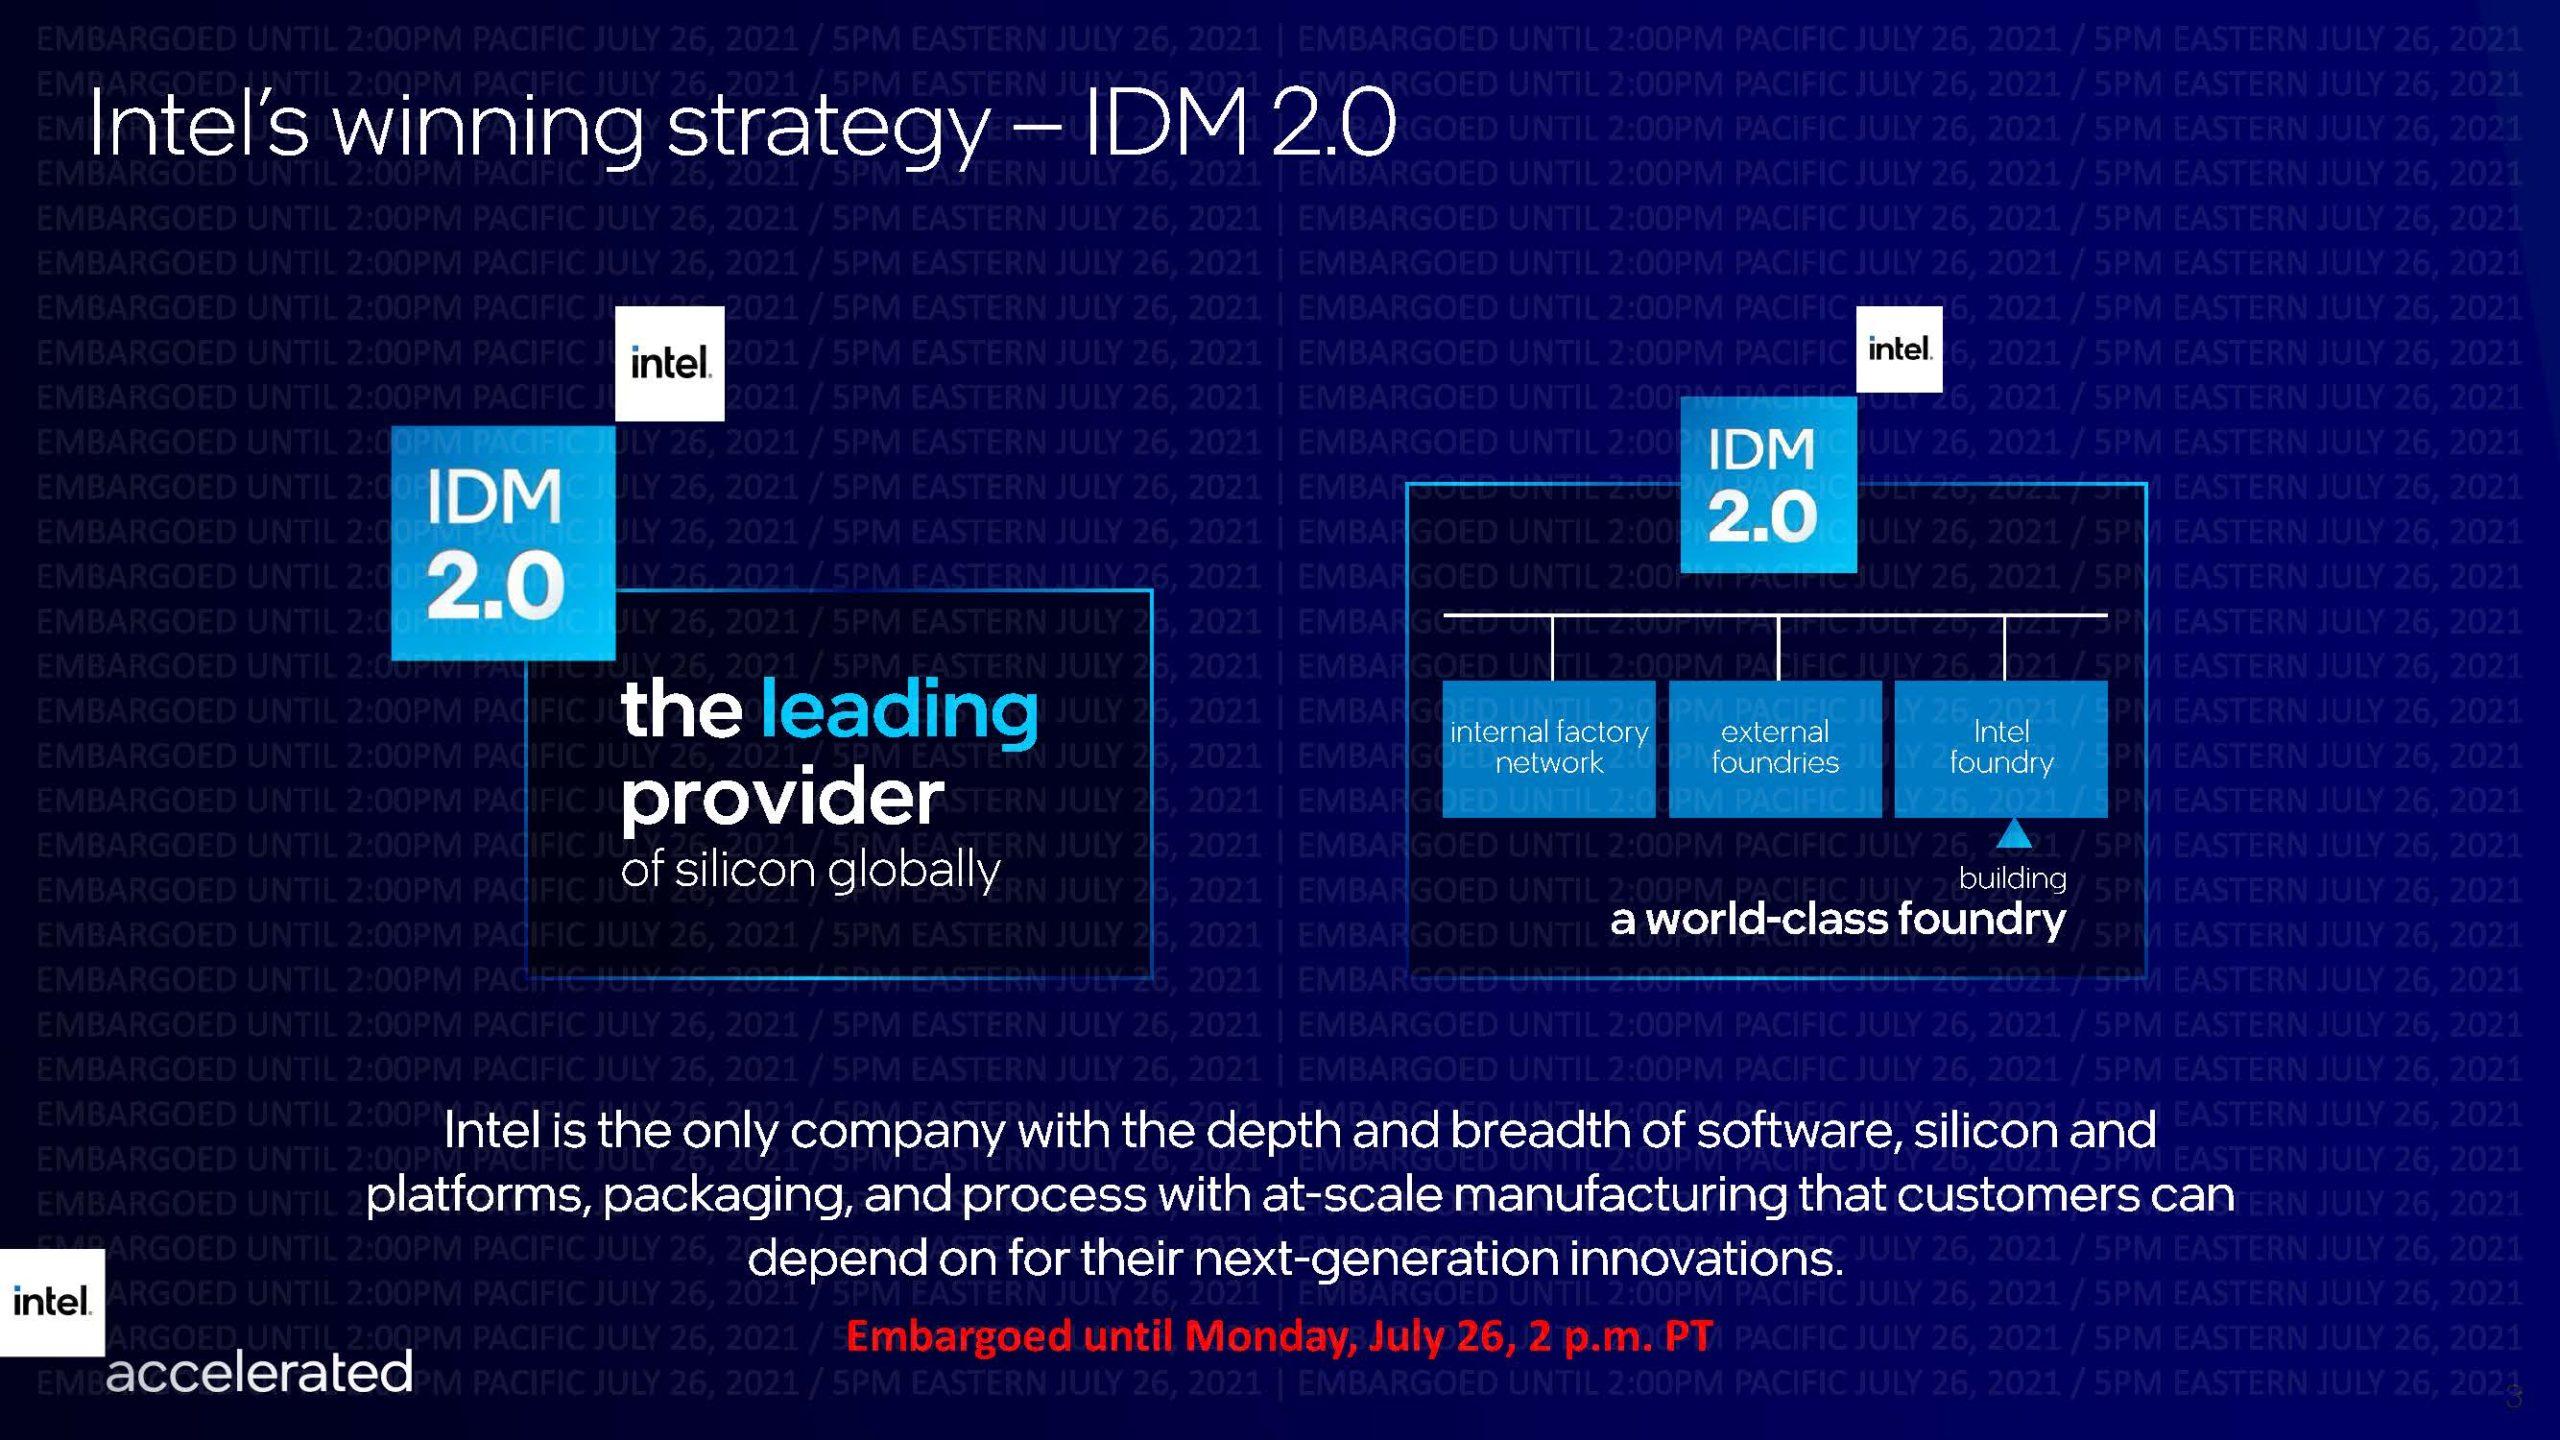 Intel IDM 2.0 Strategy 2021 07 26